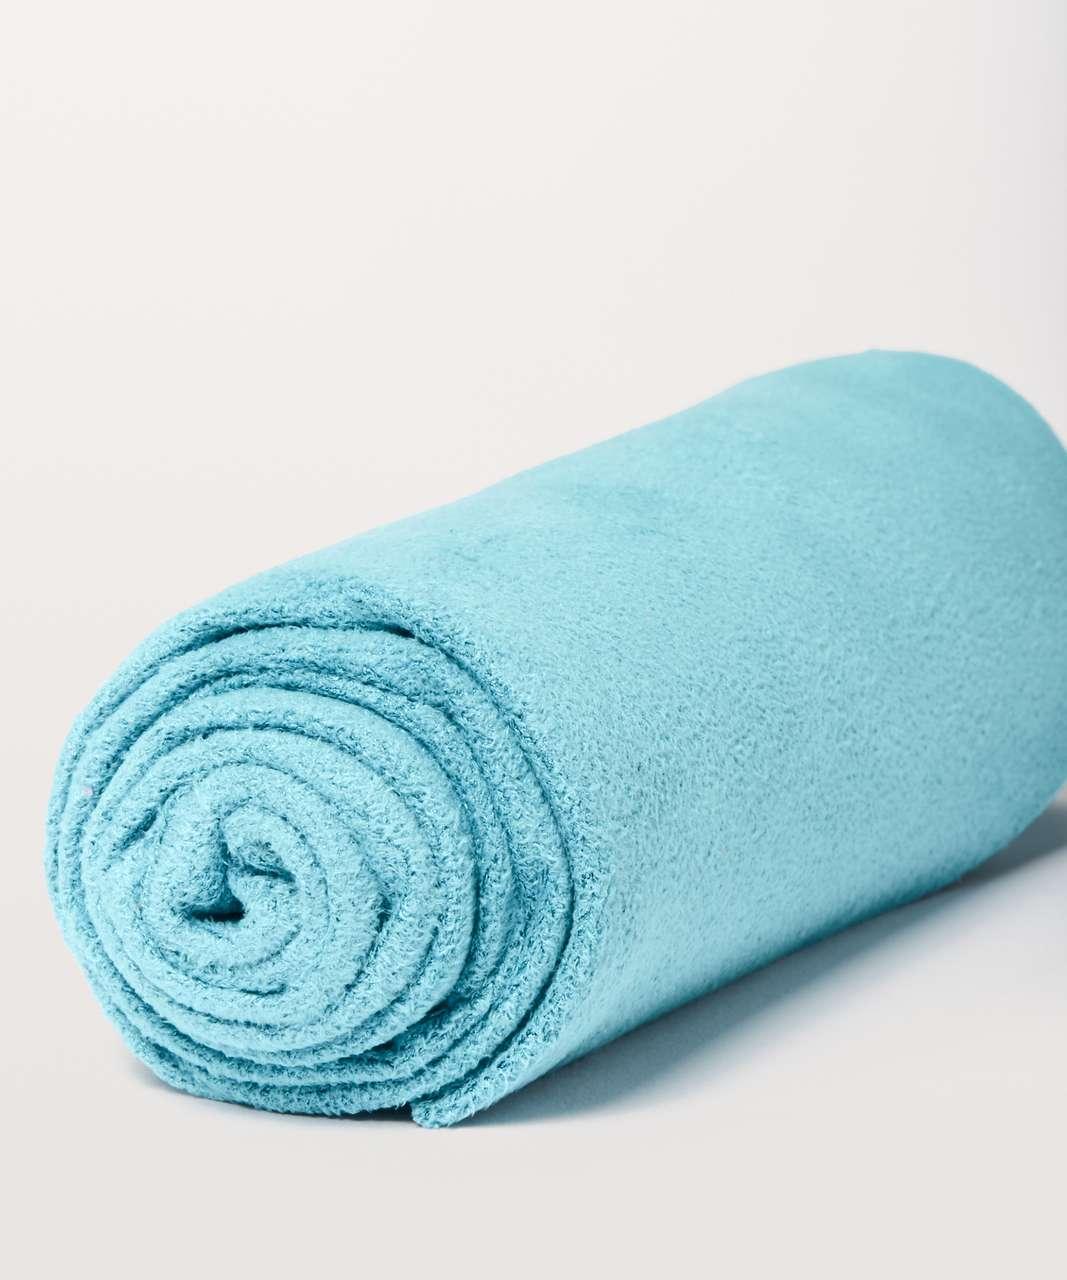 Lululemon The (Small) Towel - Eton Blue